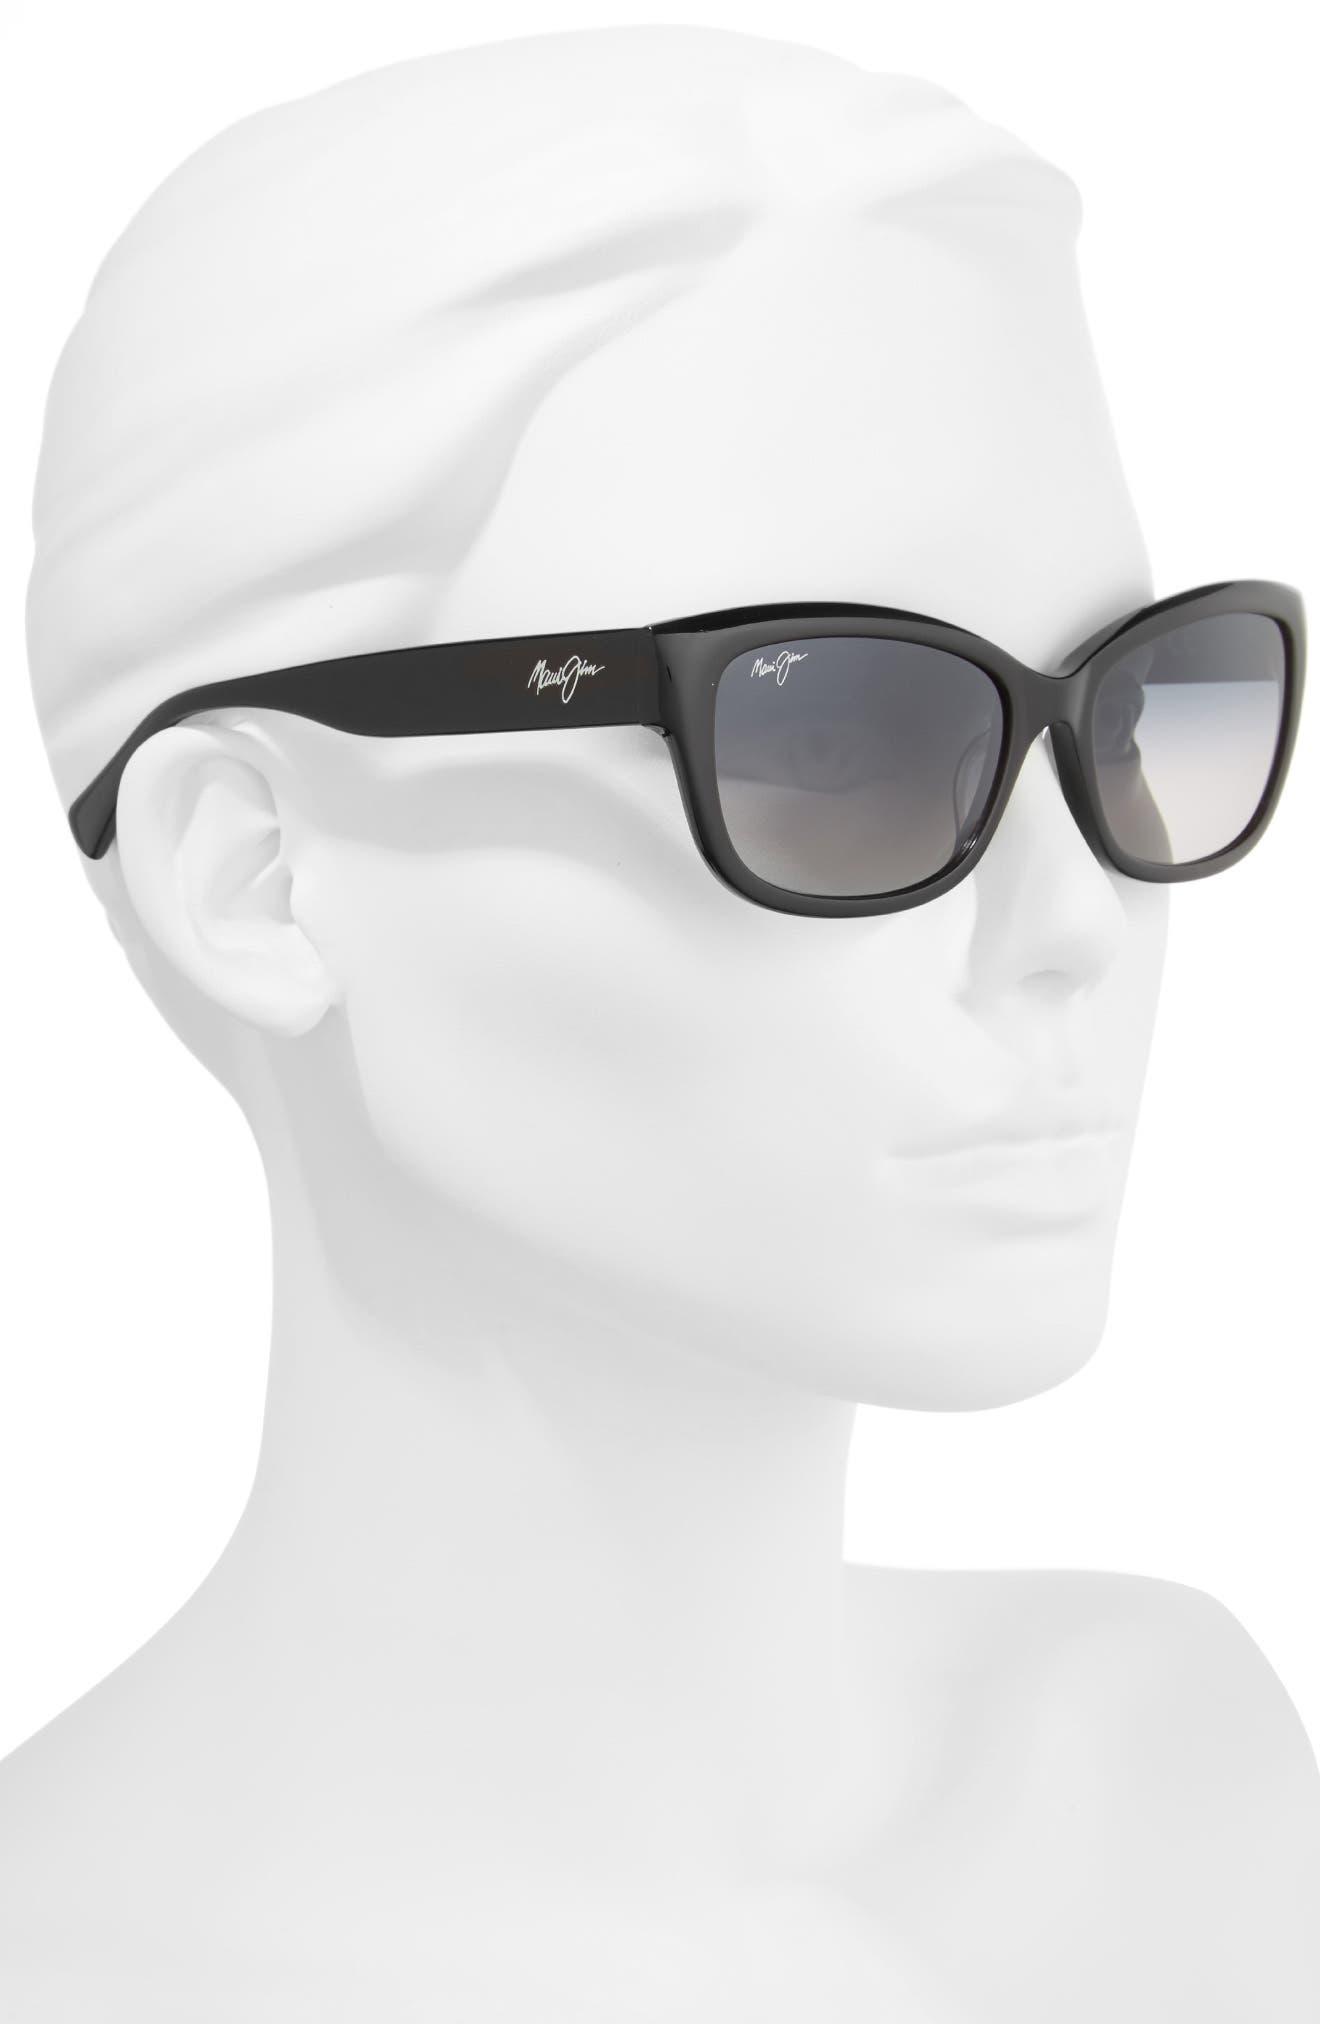 Plumeria 55mm Polarized Cat Eye Sunglasses,                             Alternate thumbnail 2, color,                             Gloss Black/ Neutral Grey